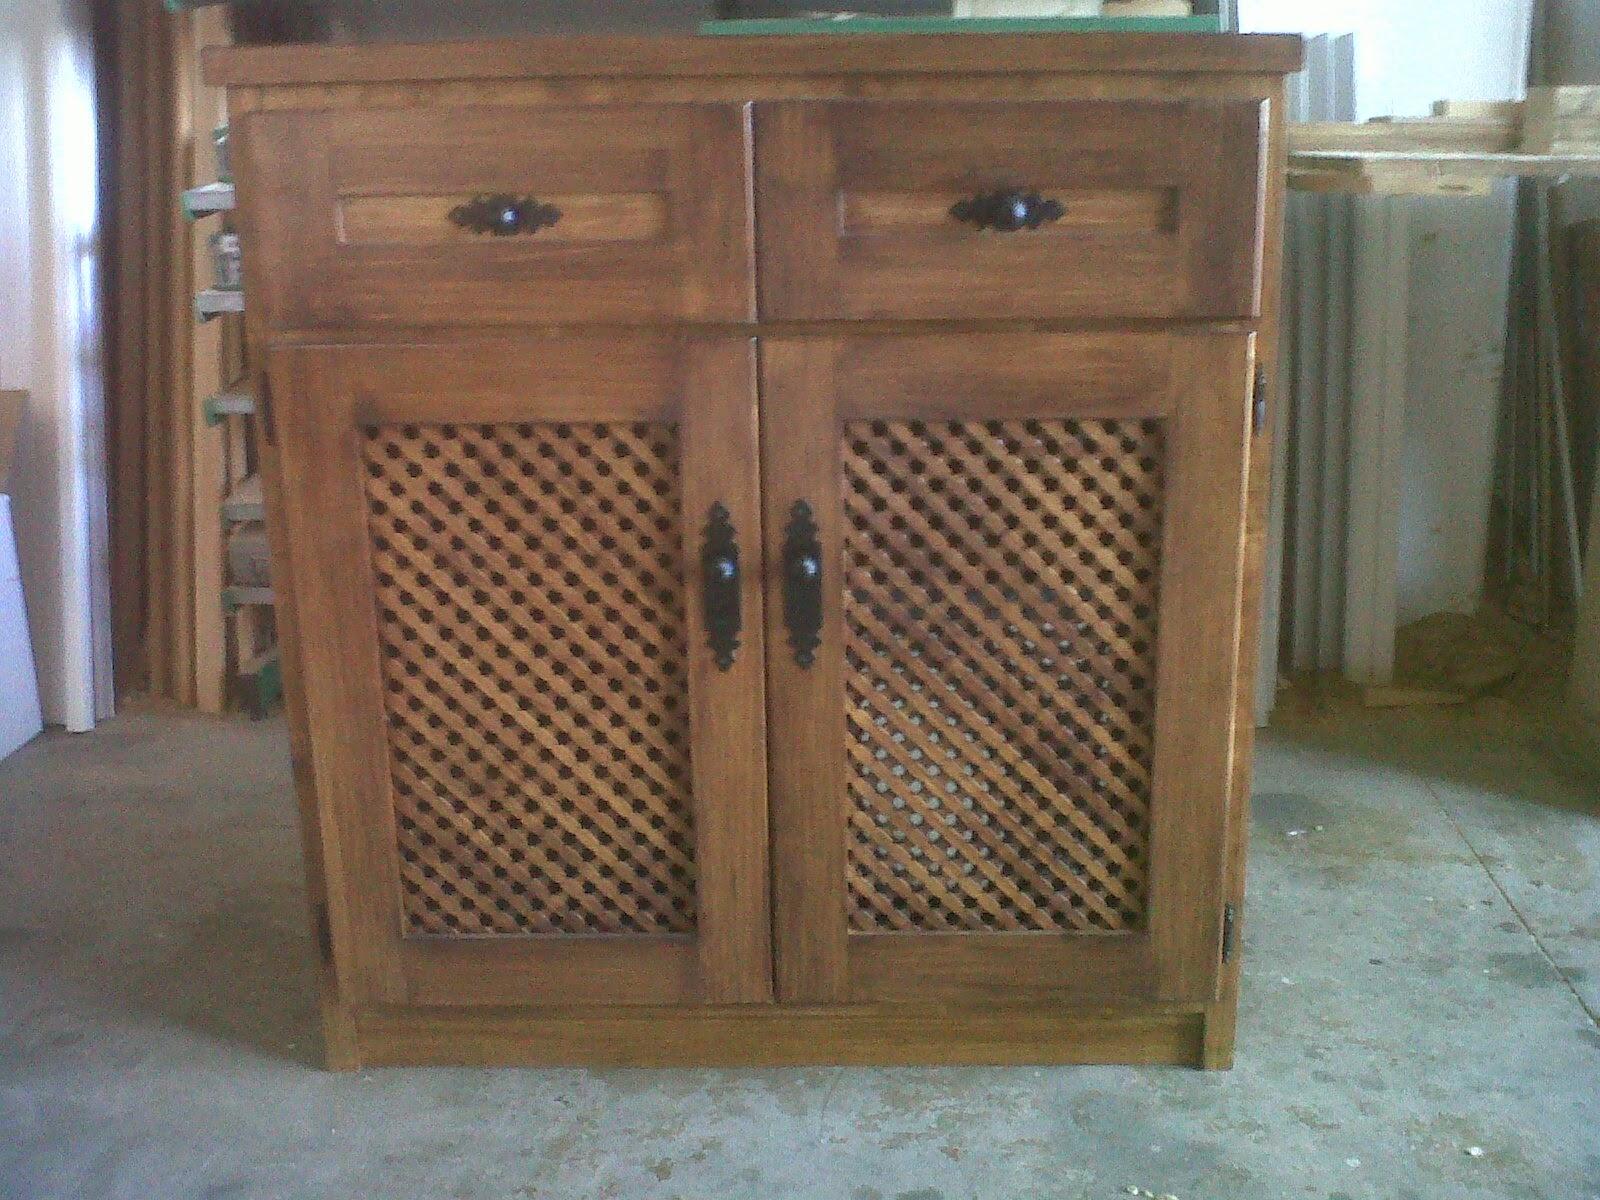 Carpinteria viosca roda mueble auxiliar para cocina - Muebles de cocina auxiliares ...